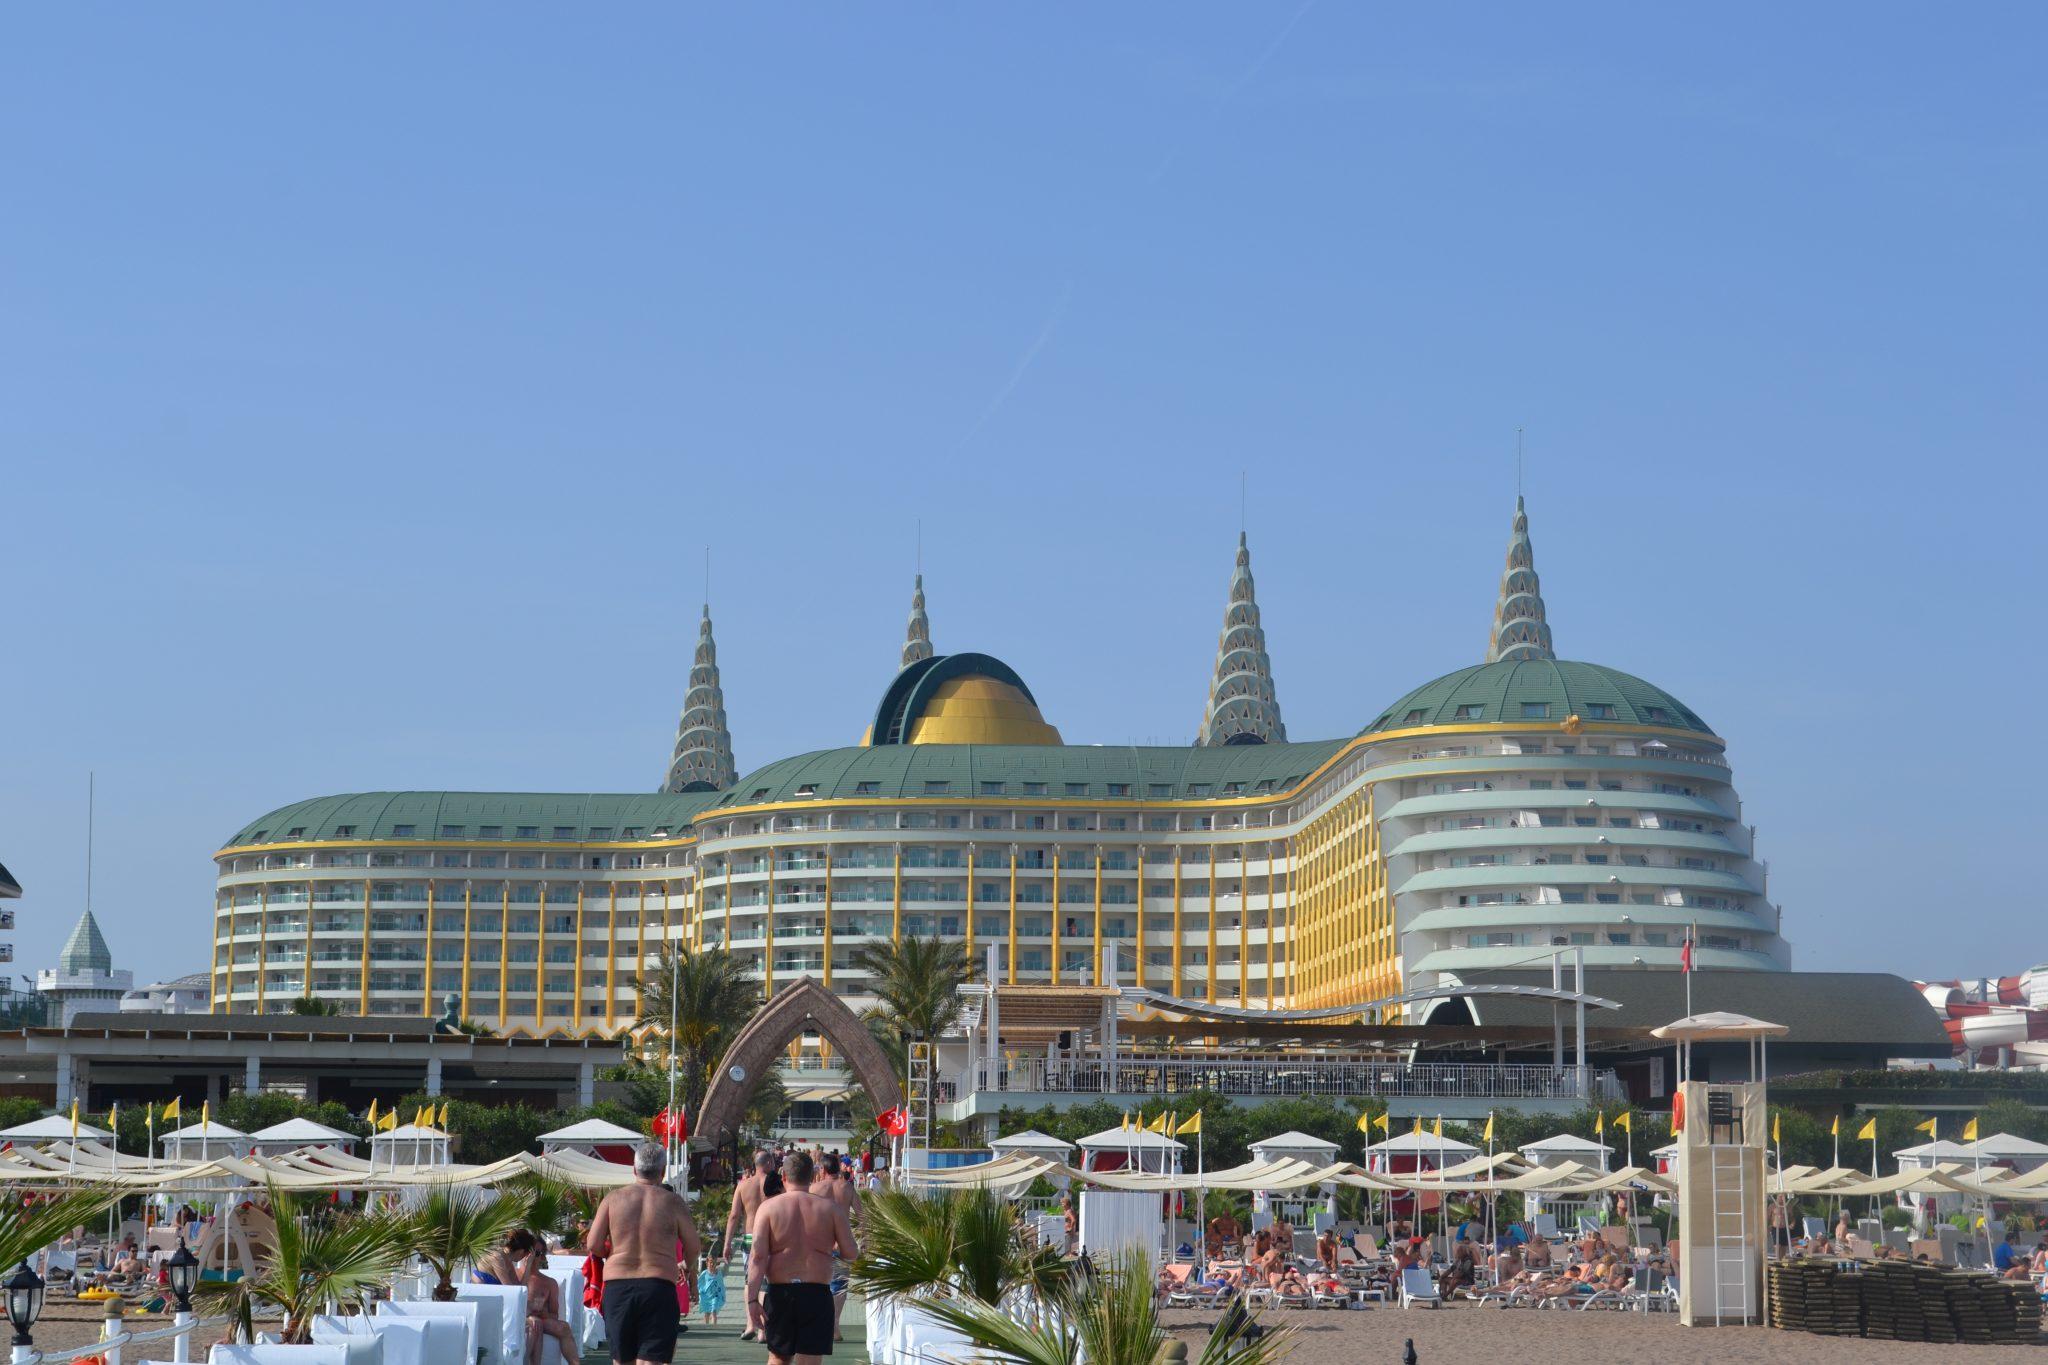 Travel Diary: Turkey - dsc 0031